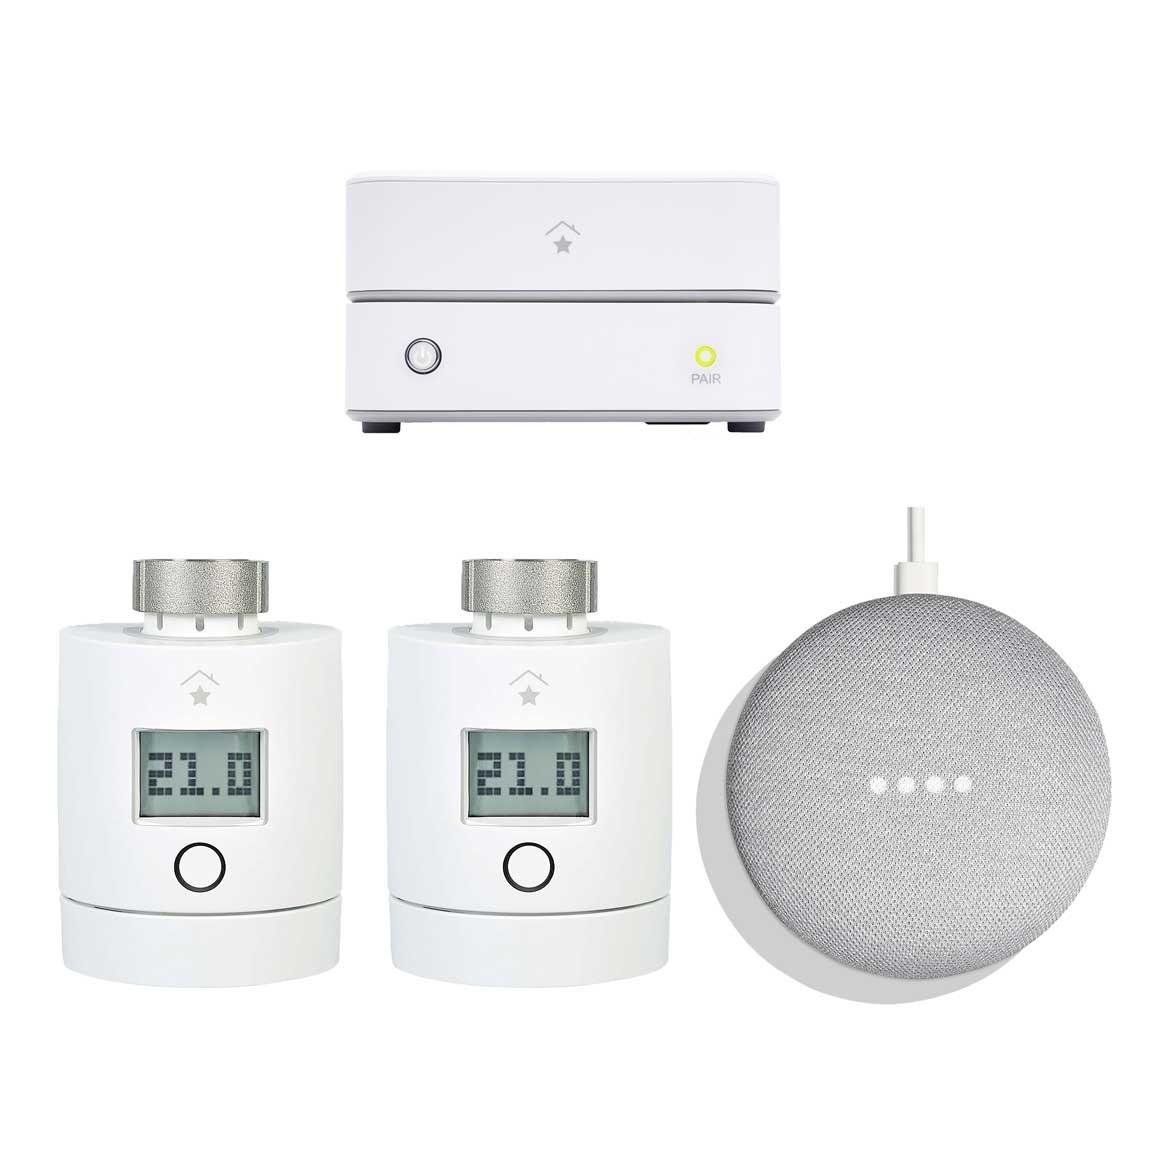 innogy SmartHome Starter Set Heizung mit 2 Thermostaten + gratis Google Home Mini